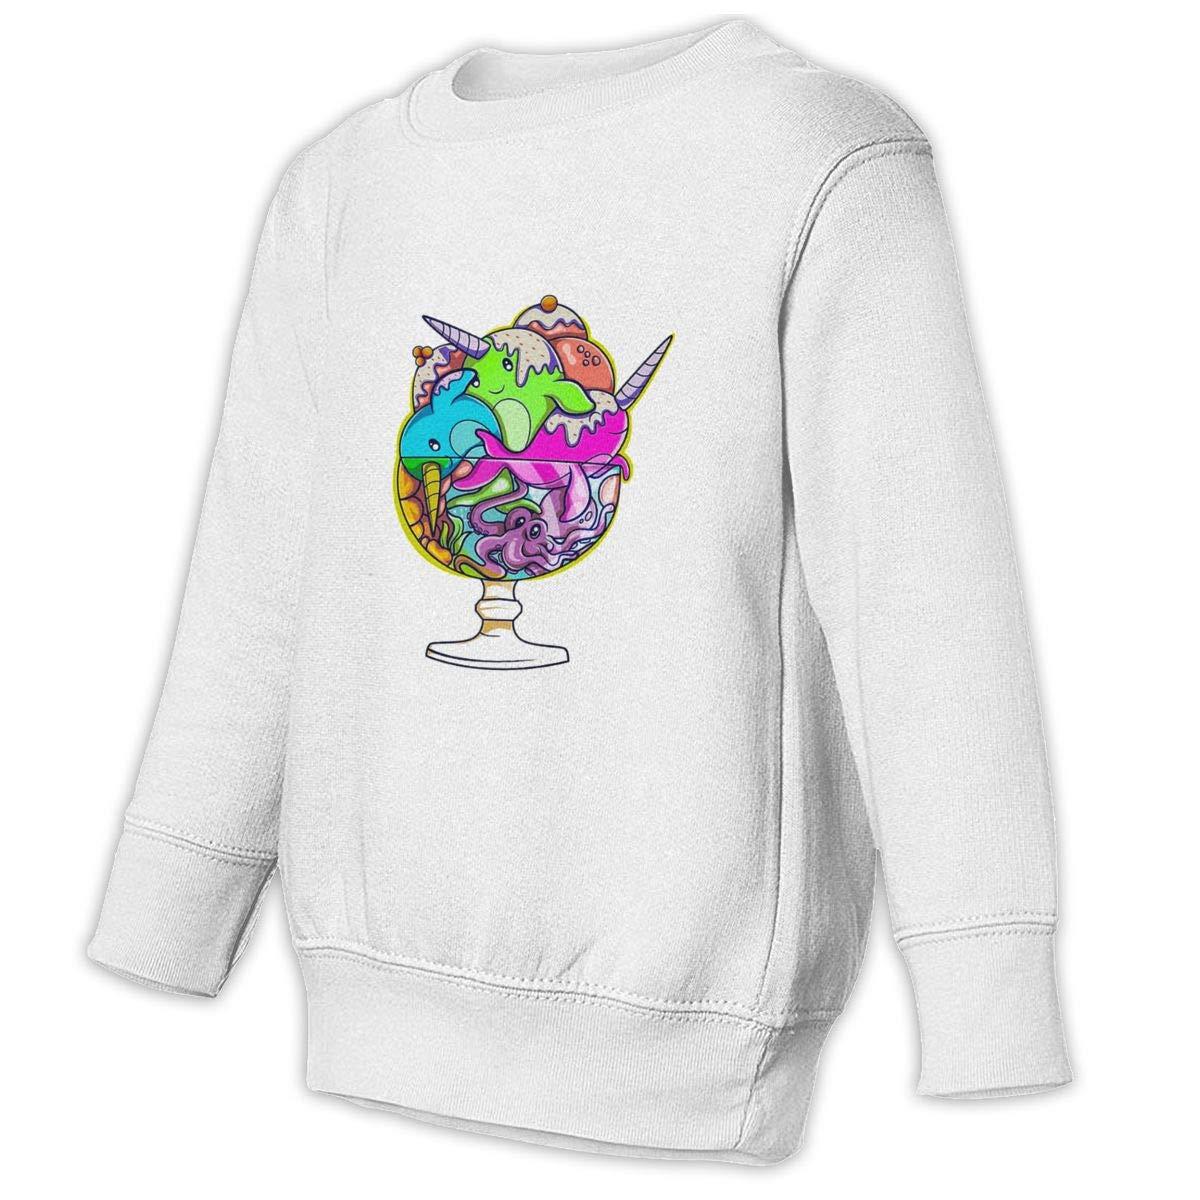 Narwhal Octopus Ice Cream Kids Unisex Cotton Long Sleeve Round Neck Sweatshirt